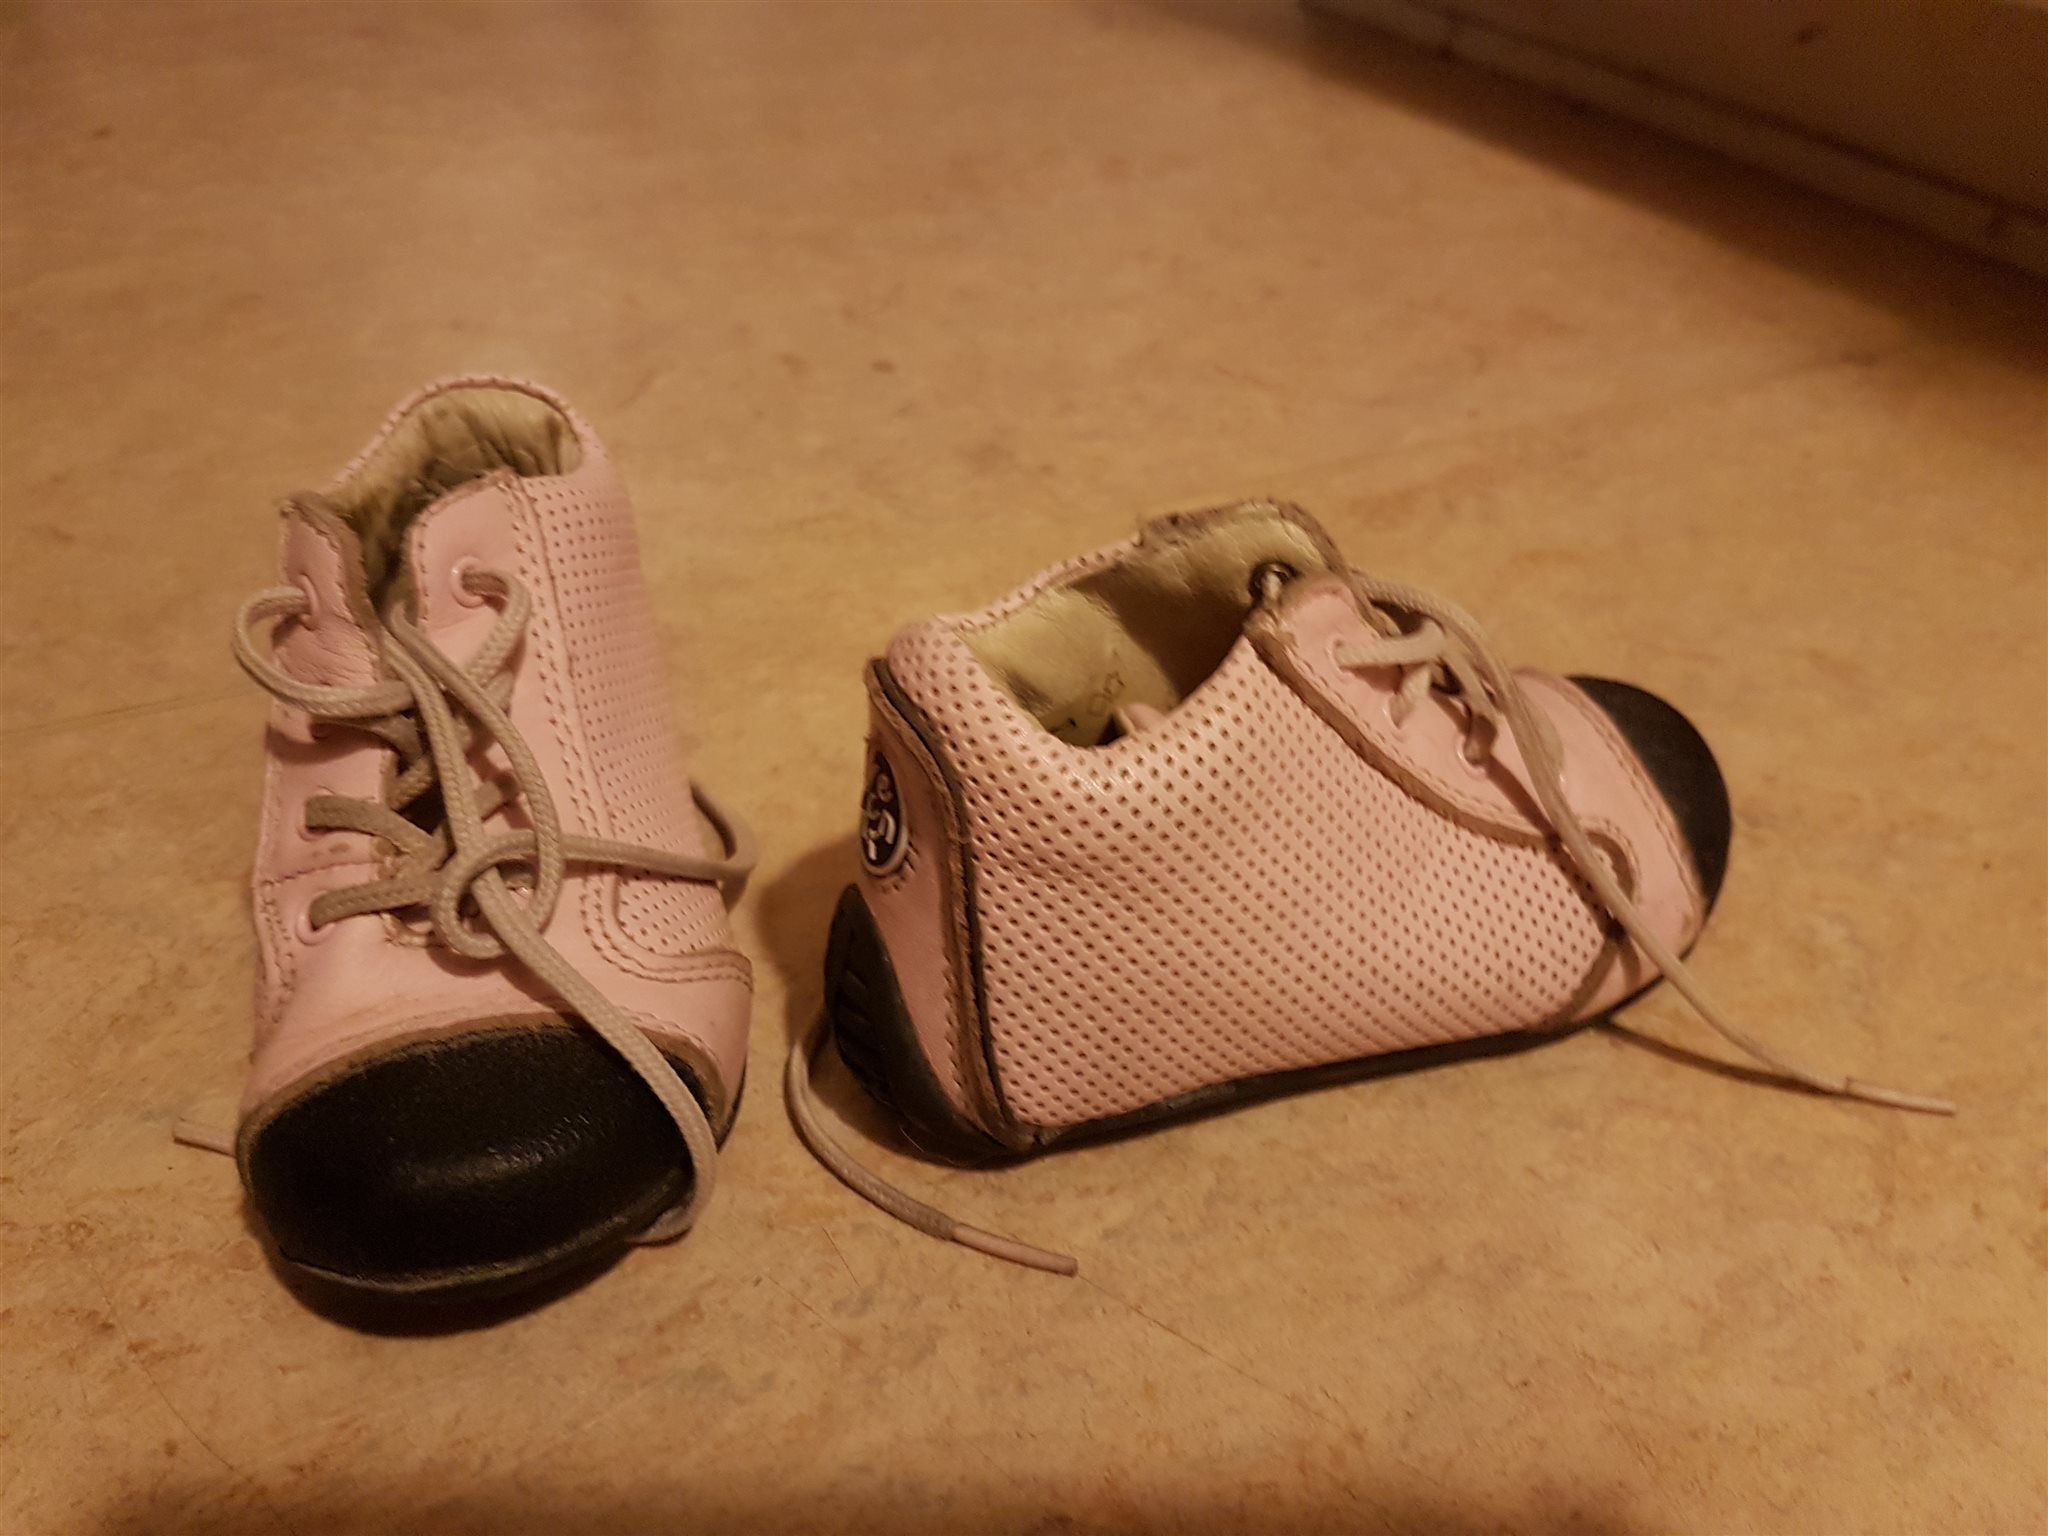 3f0bcacf260 Vincent skor storlek 22 rosa läder (354107587) ᐈ Köp på Tradera